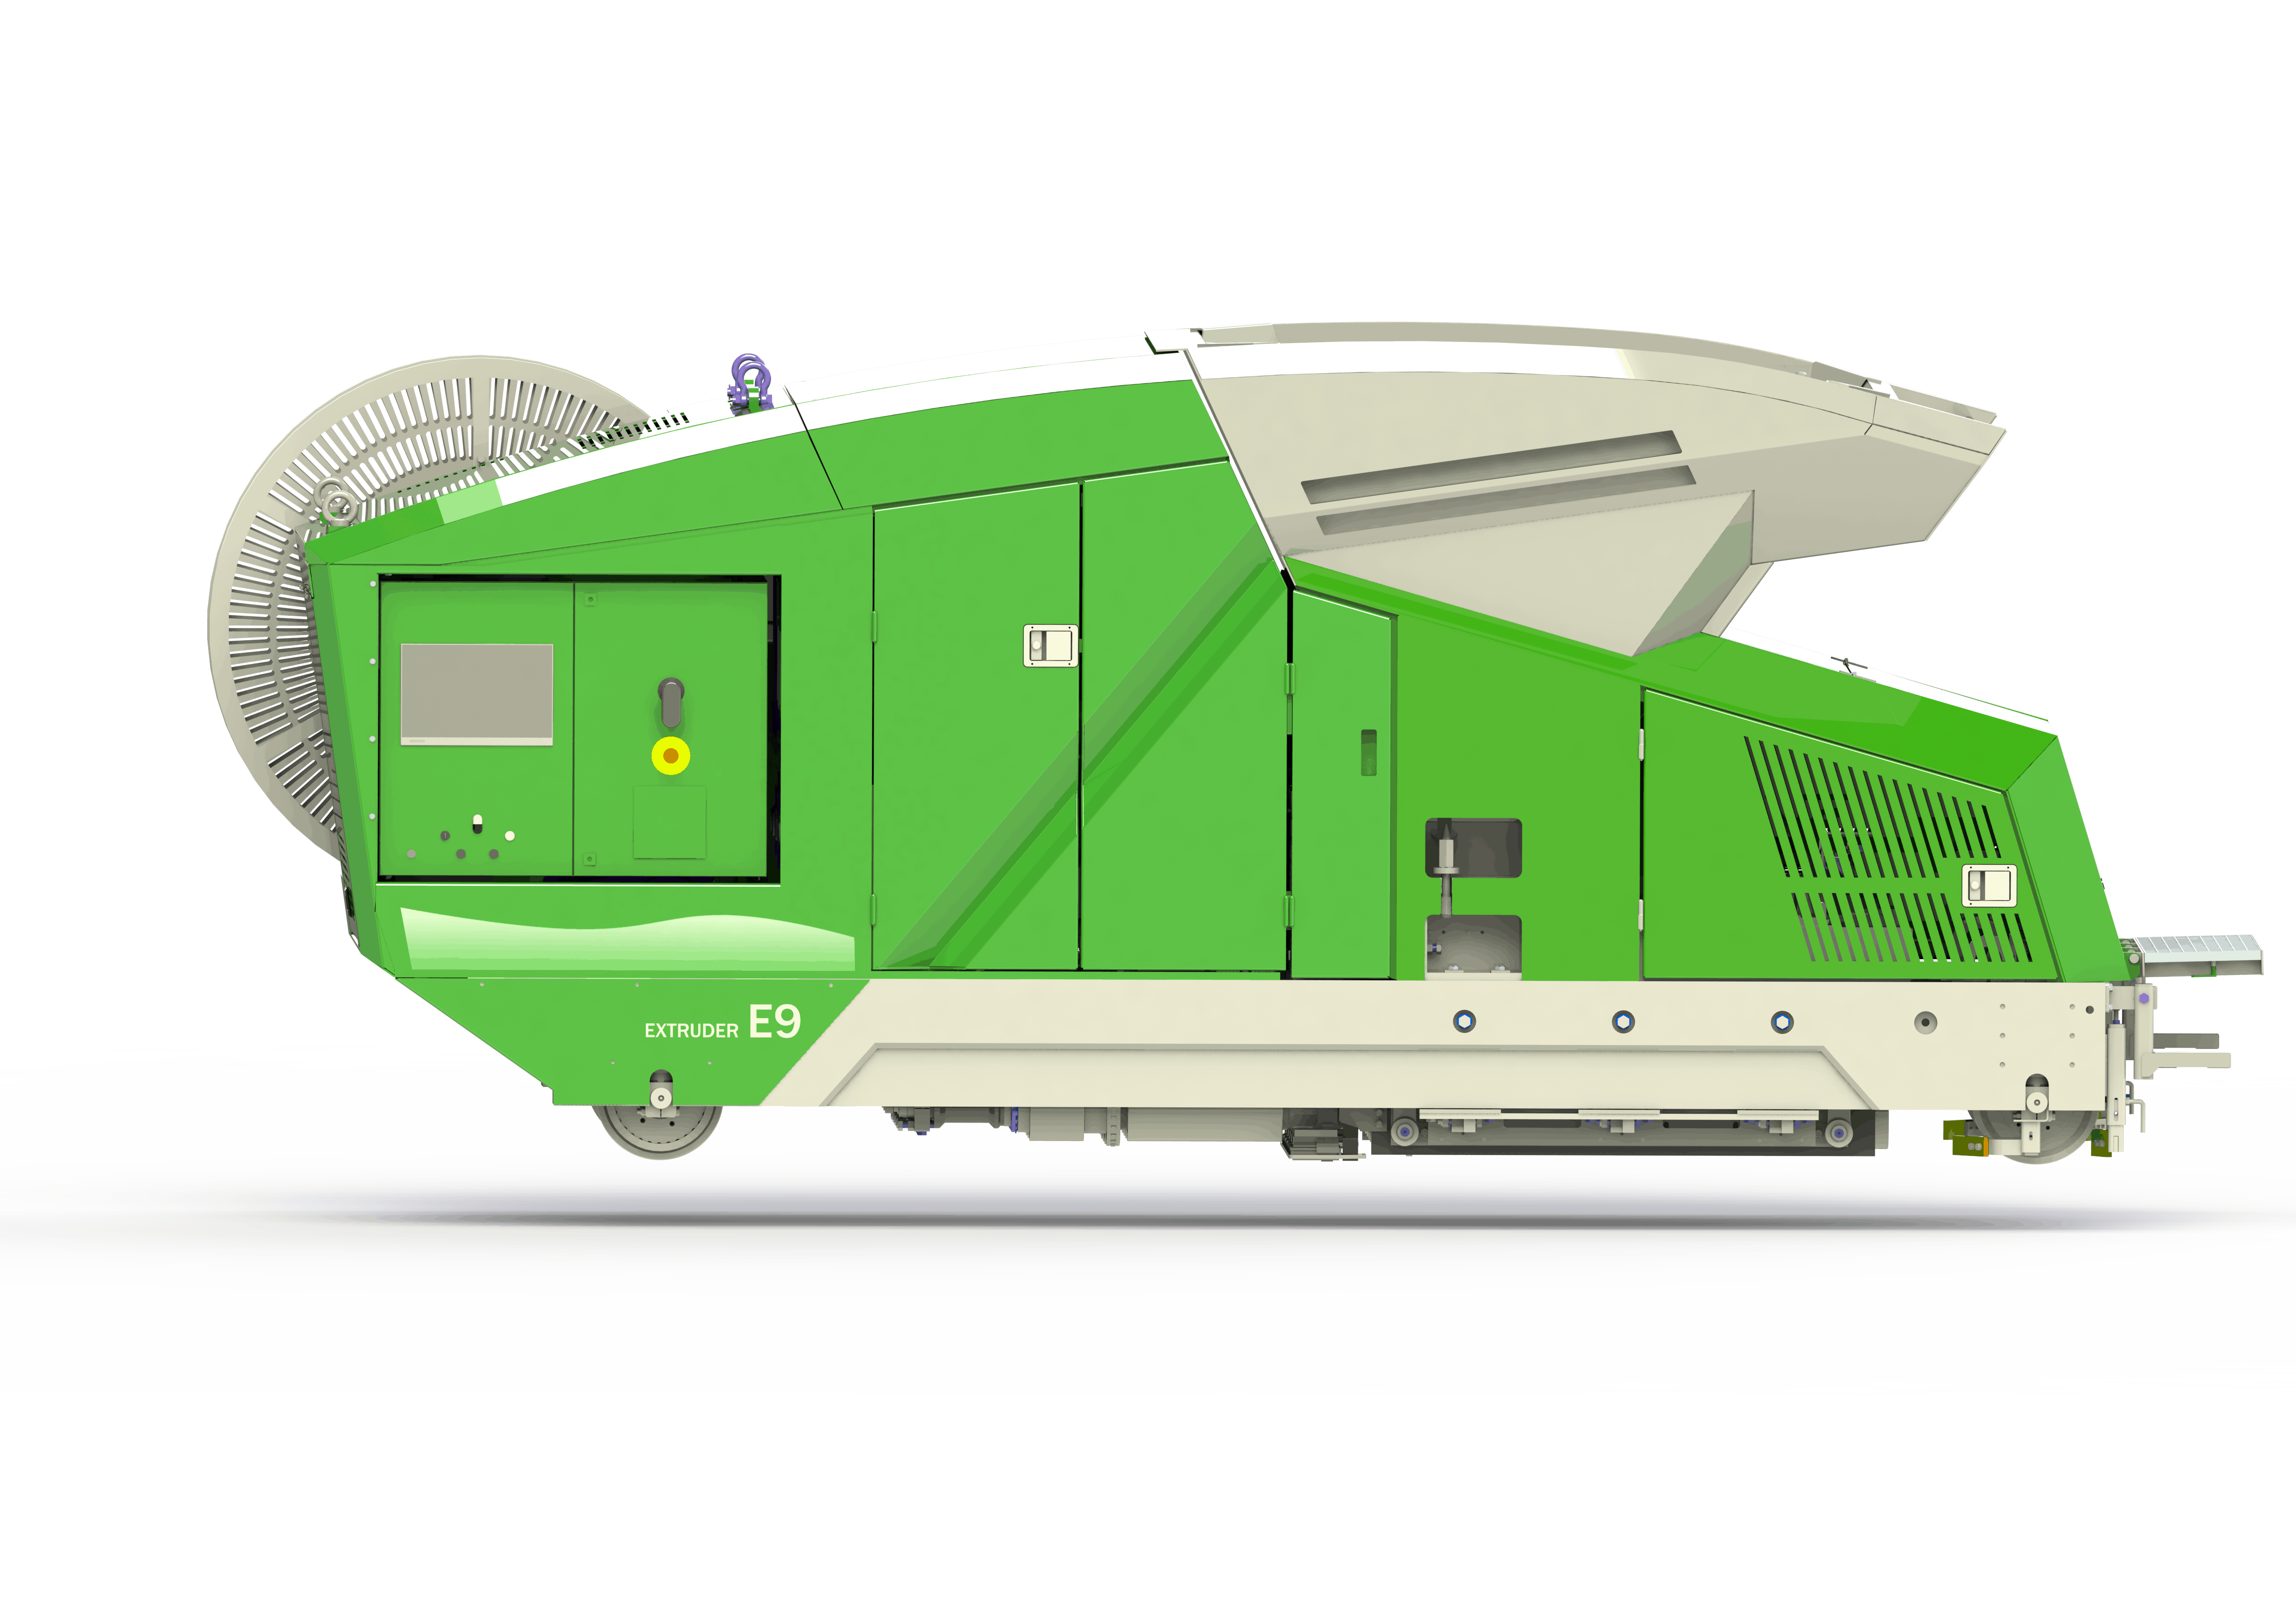 Elematic Extruder E9 2019